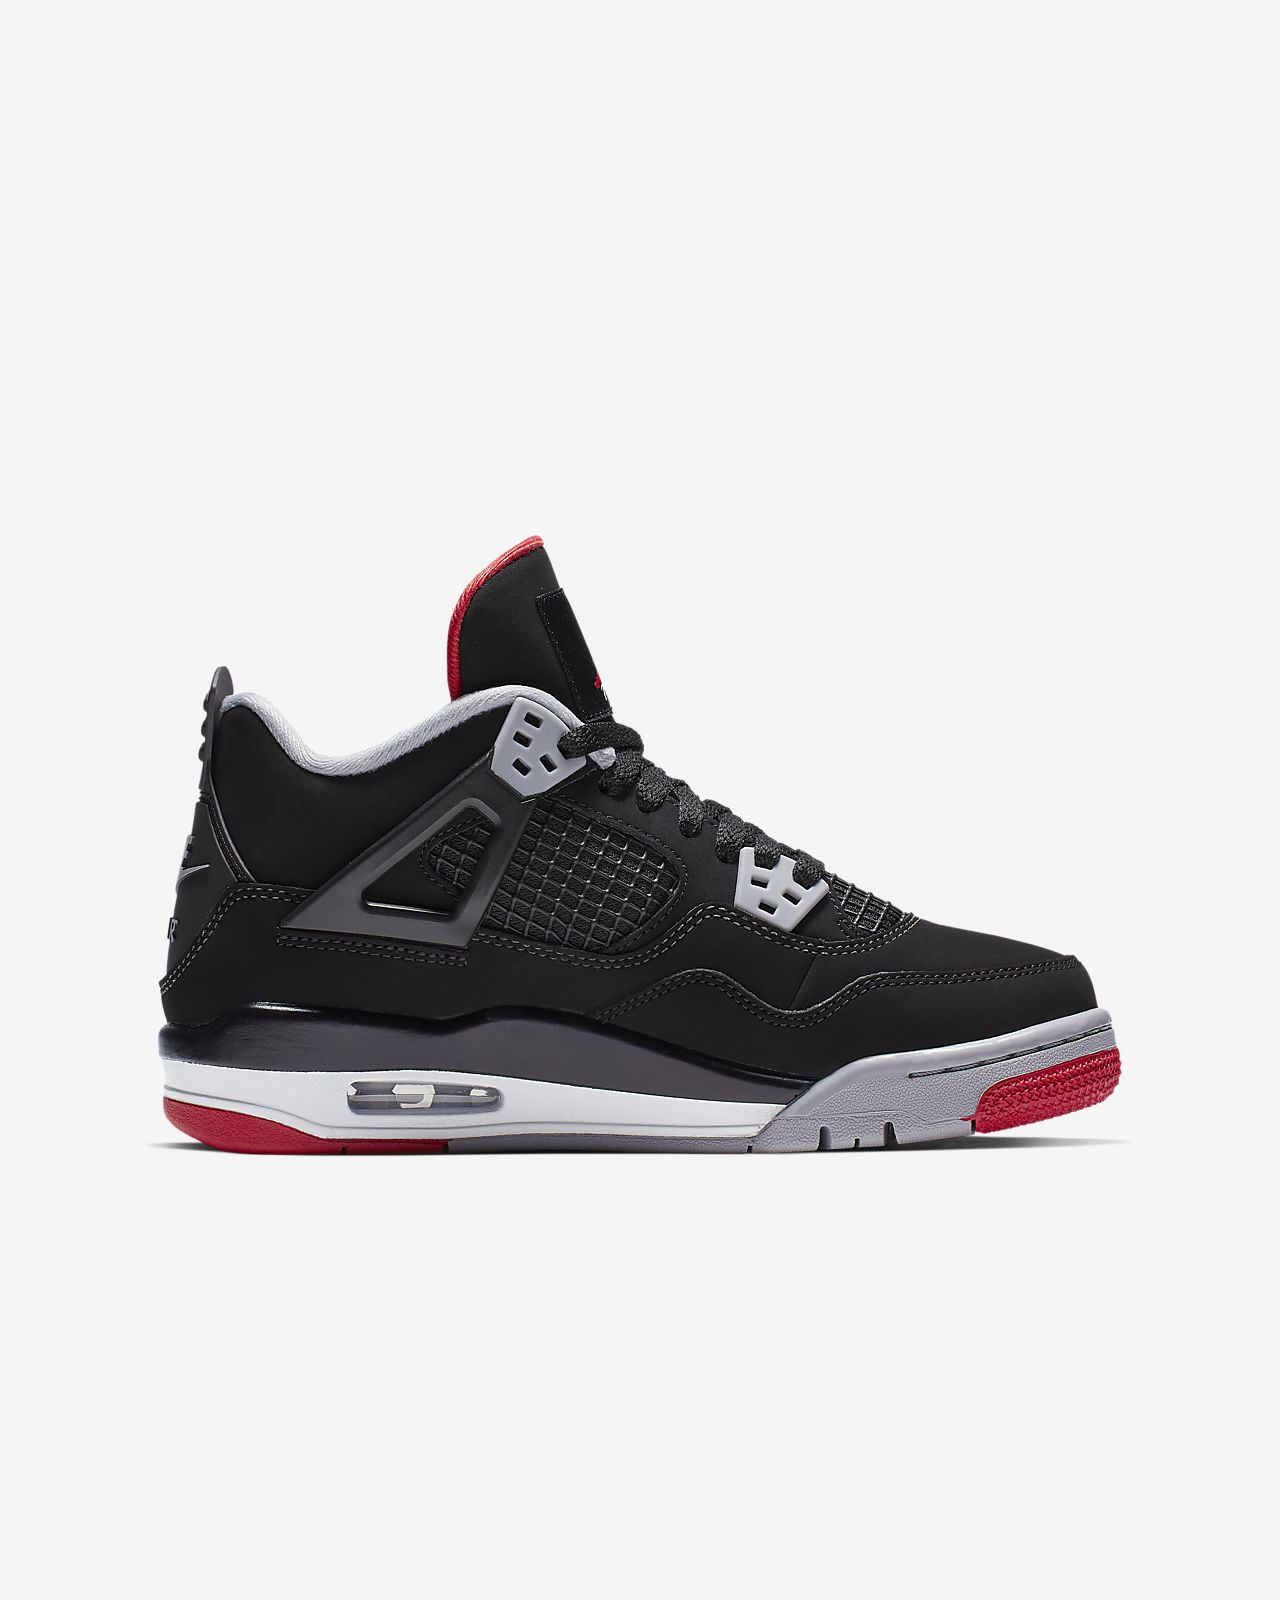 the best attitude 120e3 7fd09 ... Air Jordan 4 Retro Older Kids  Shoe